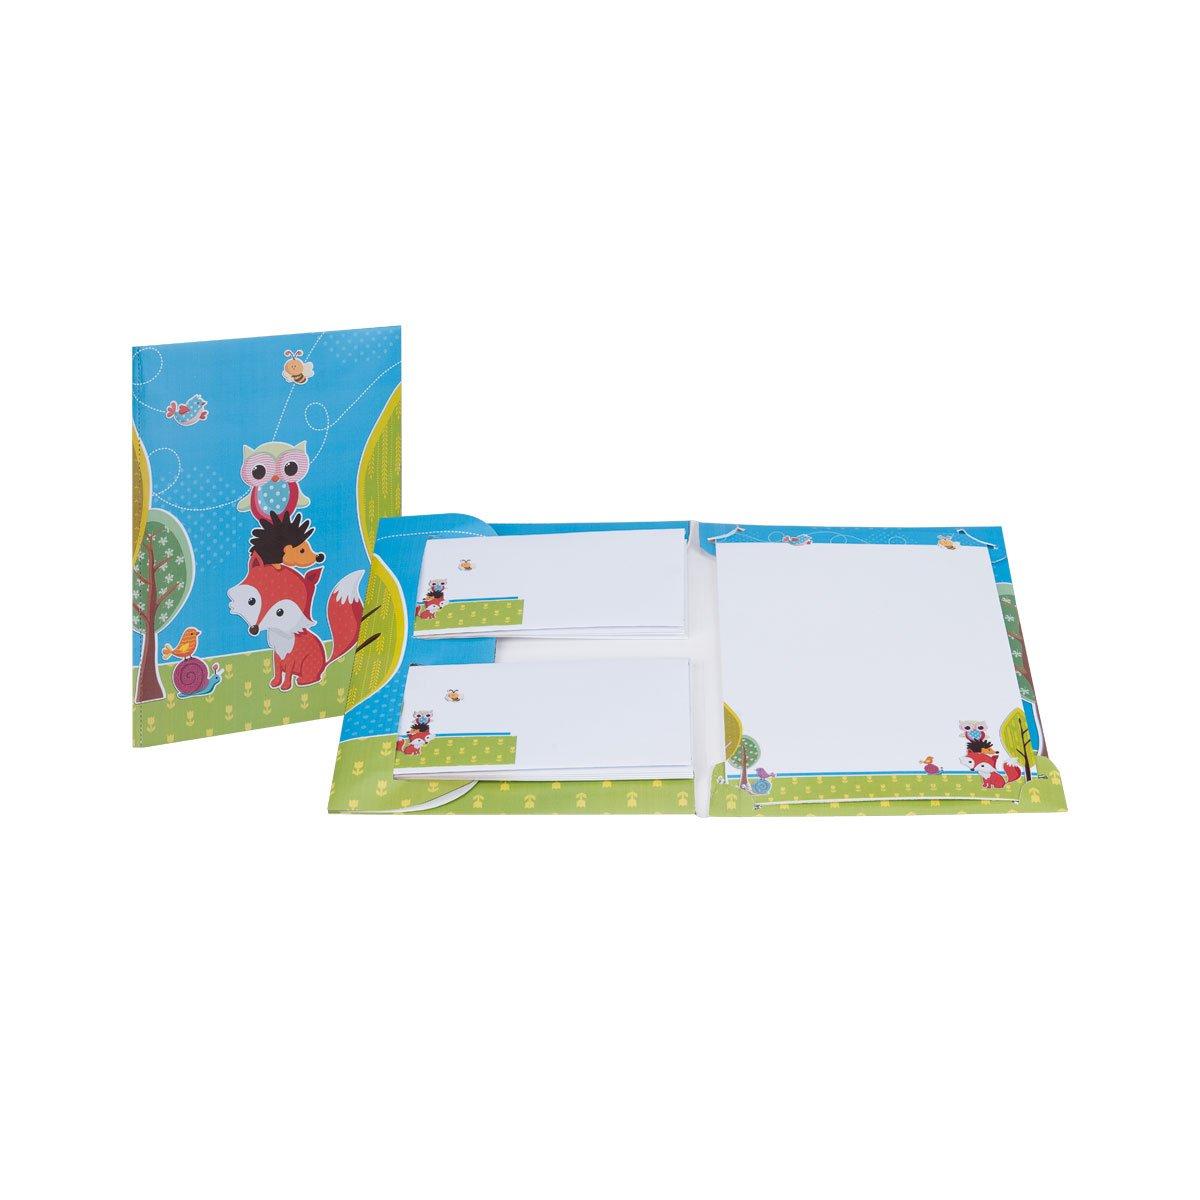 Rössler Papier - - Waldtiere - Briefpack 10 10-165x235 90x177 - Liefermenge  6 Stück B07CX6VZ84 | Gewinnen Sie hoch geschätzt